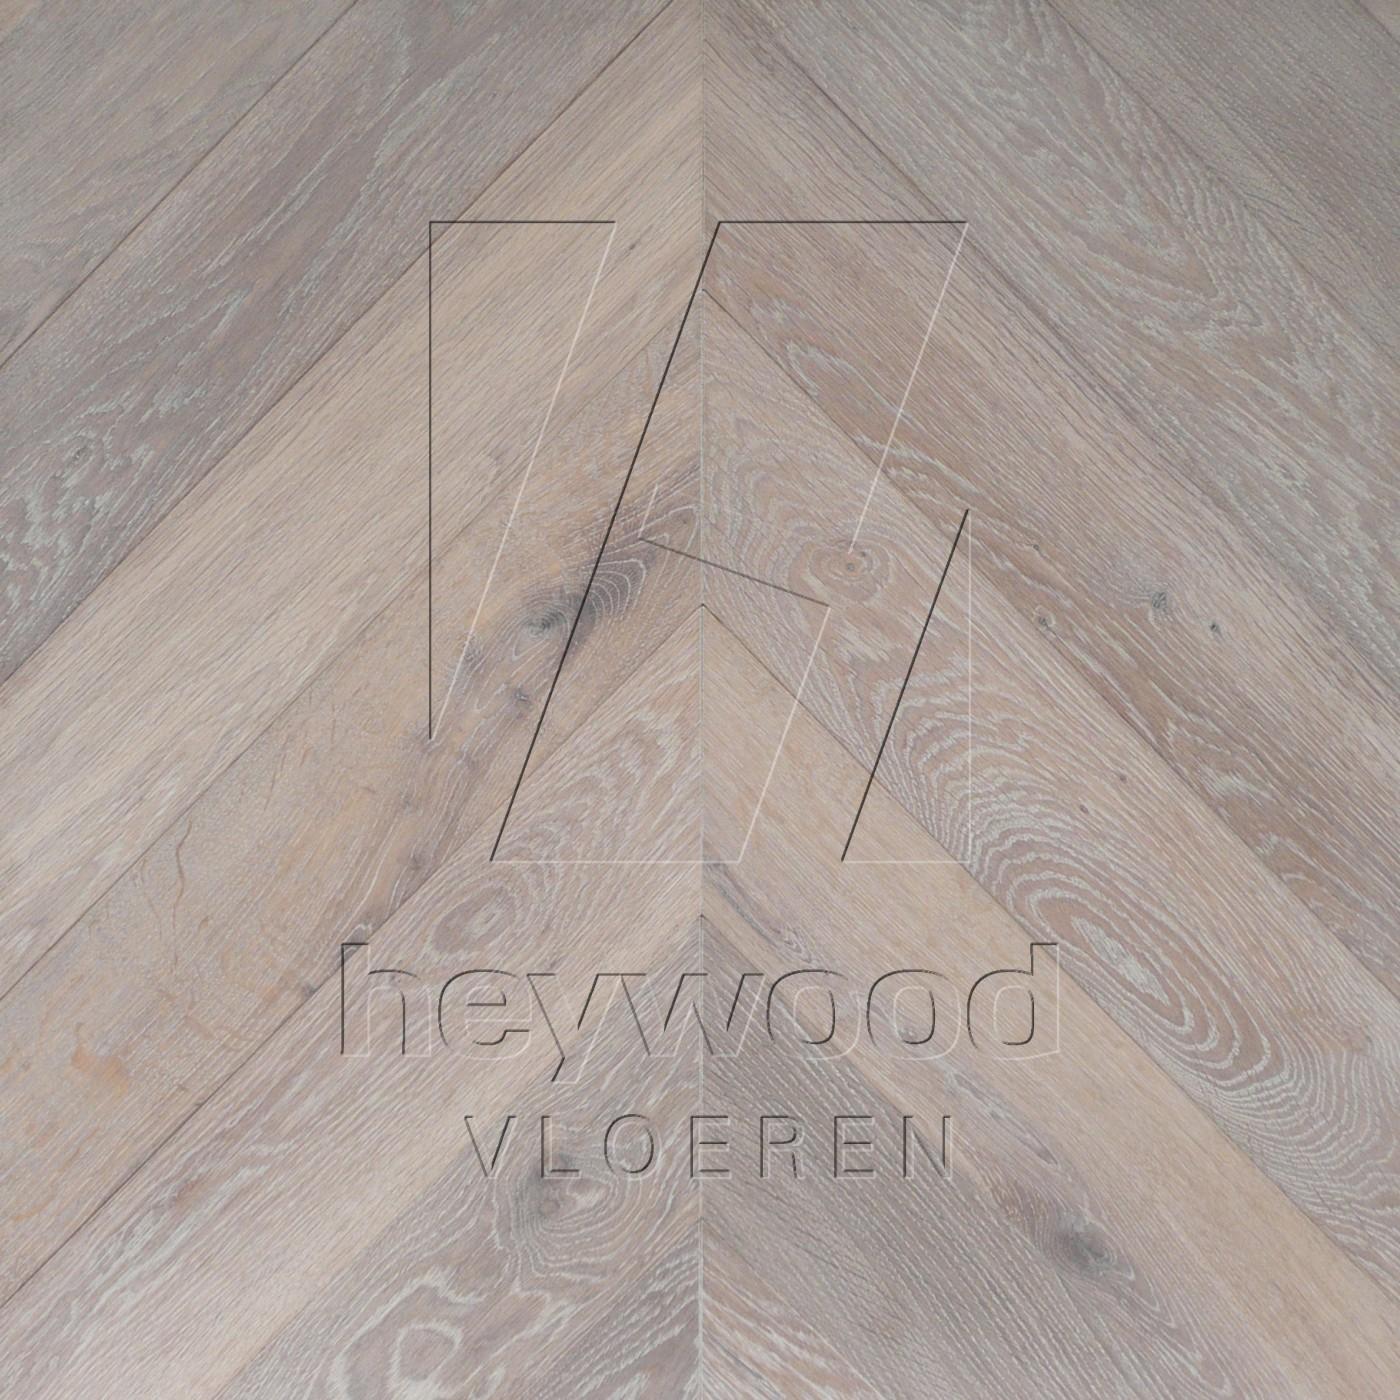 'Tundra Grey' Chevron 45°, Bespoke Character in Chevron of Pattern & Panel Floors